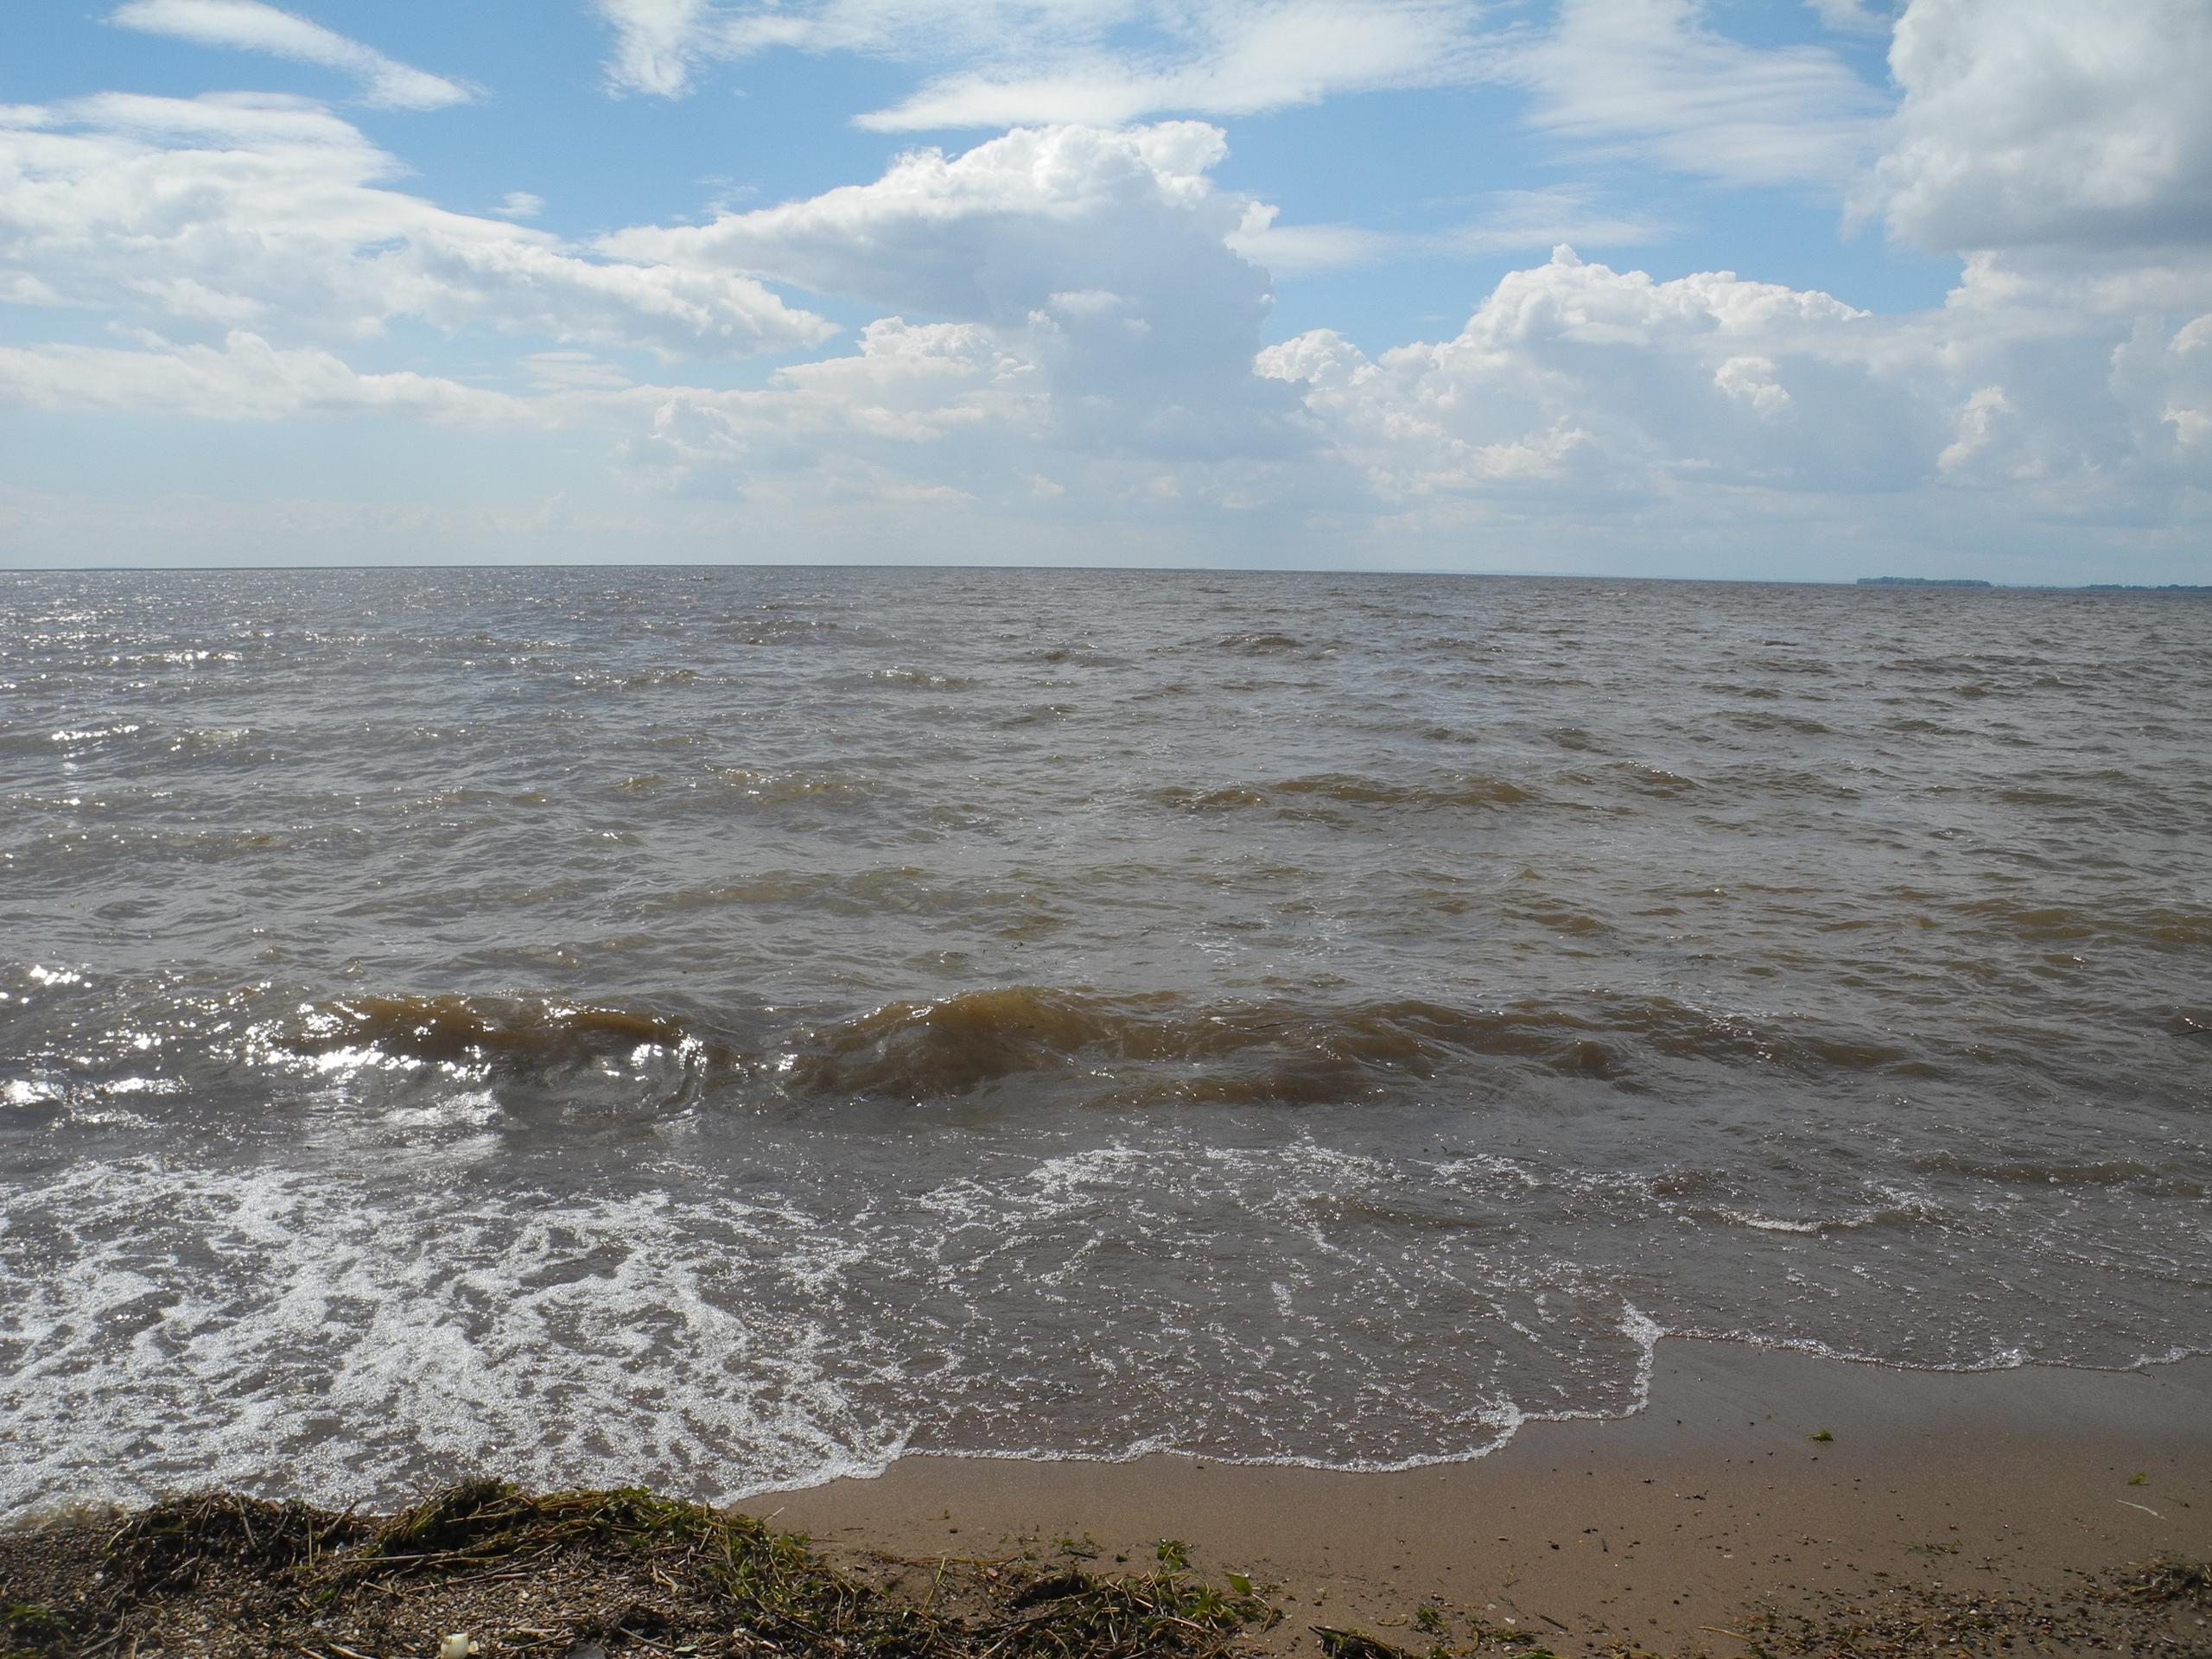 камское море